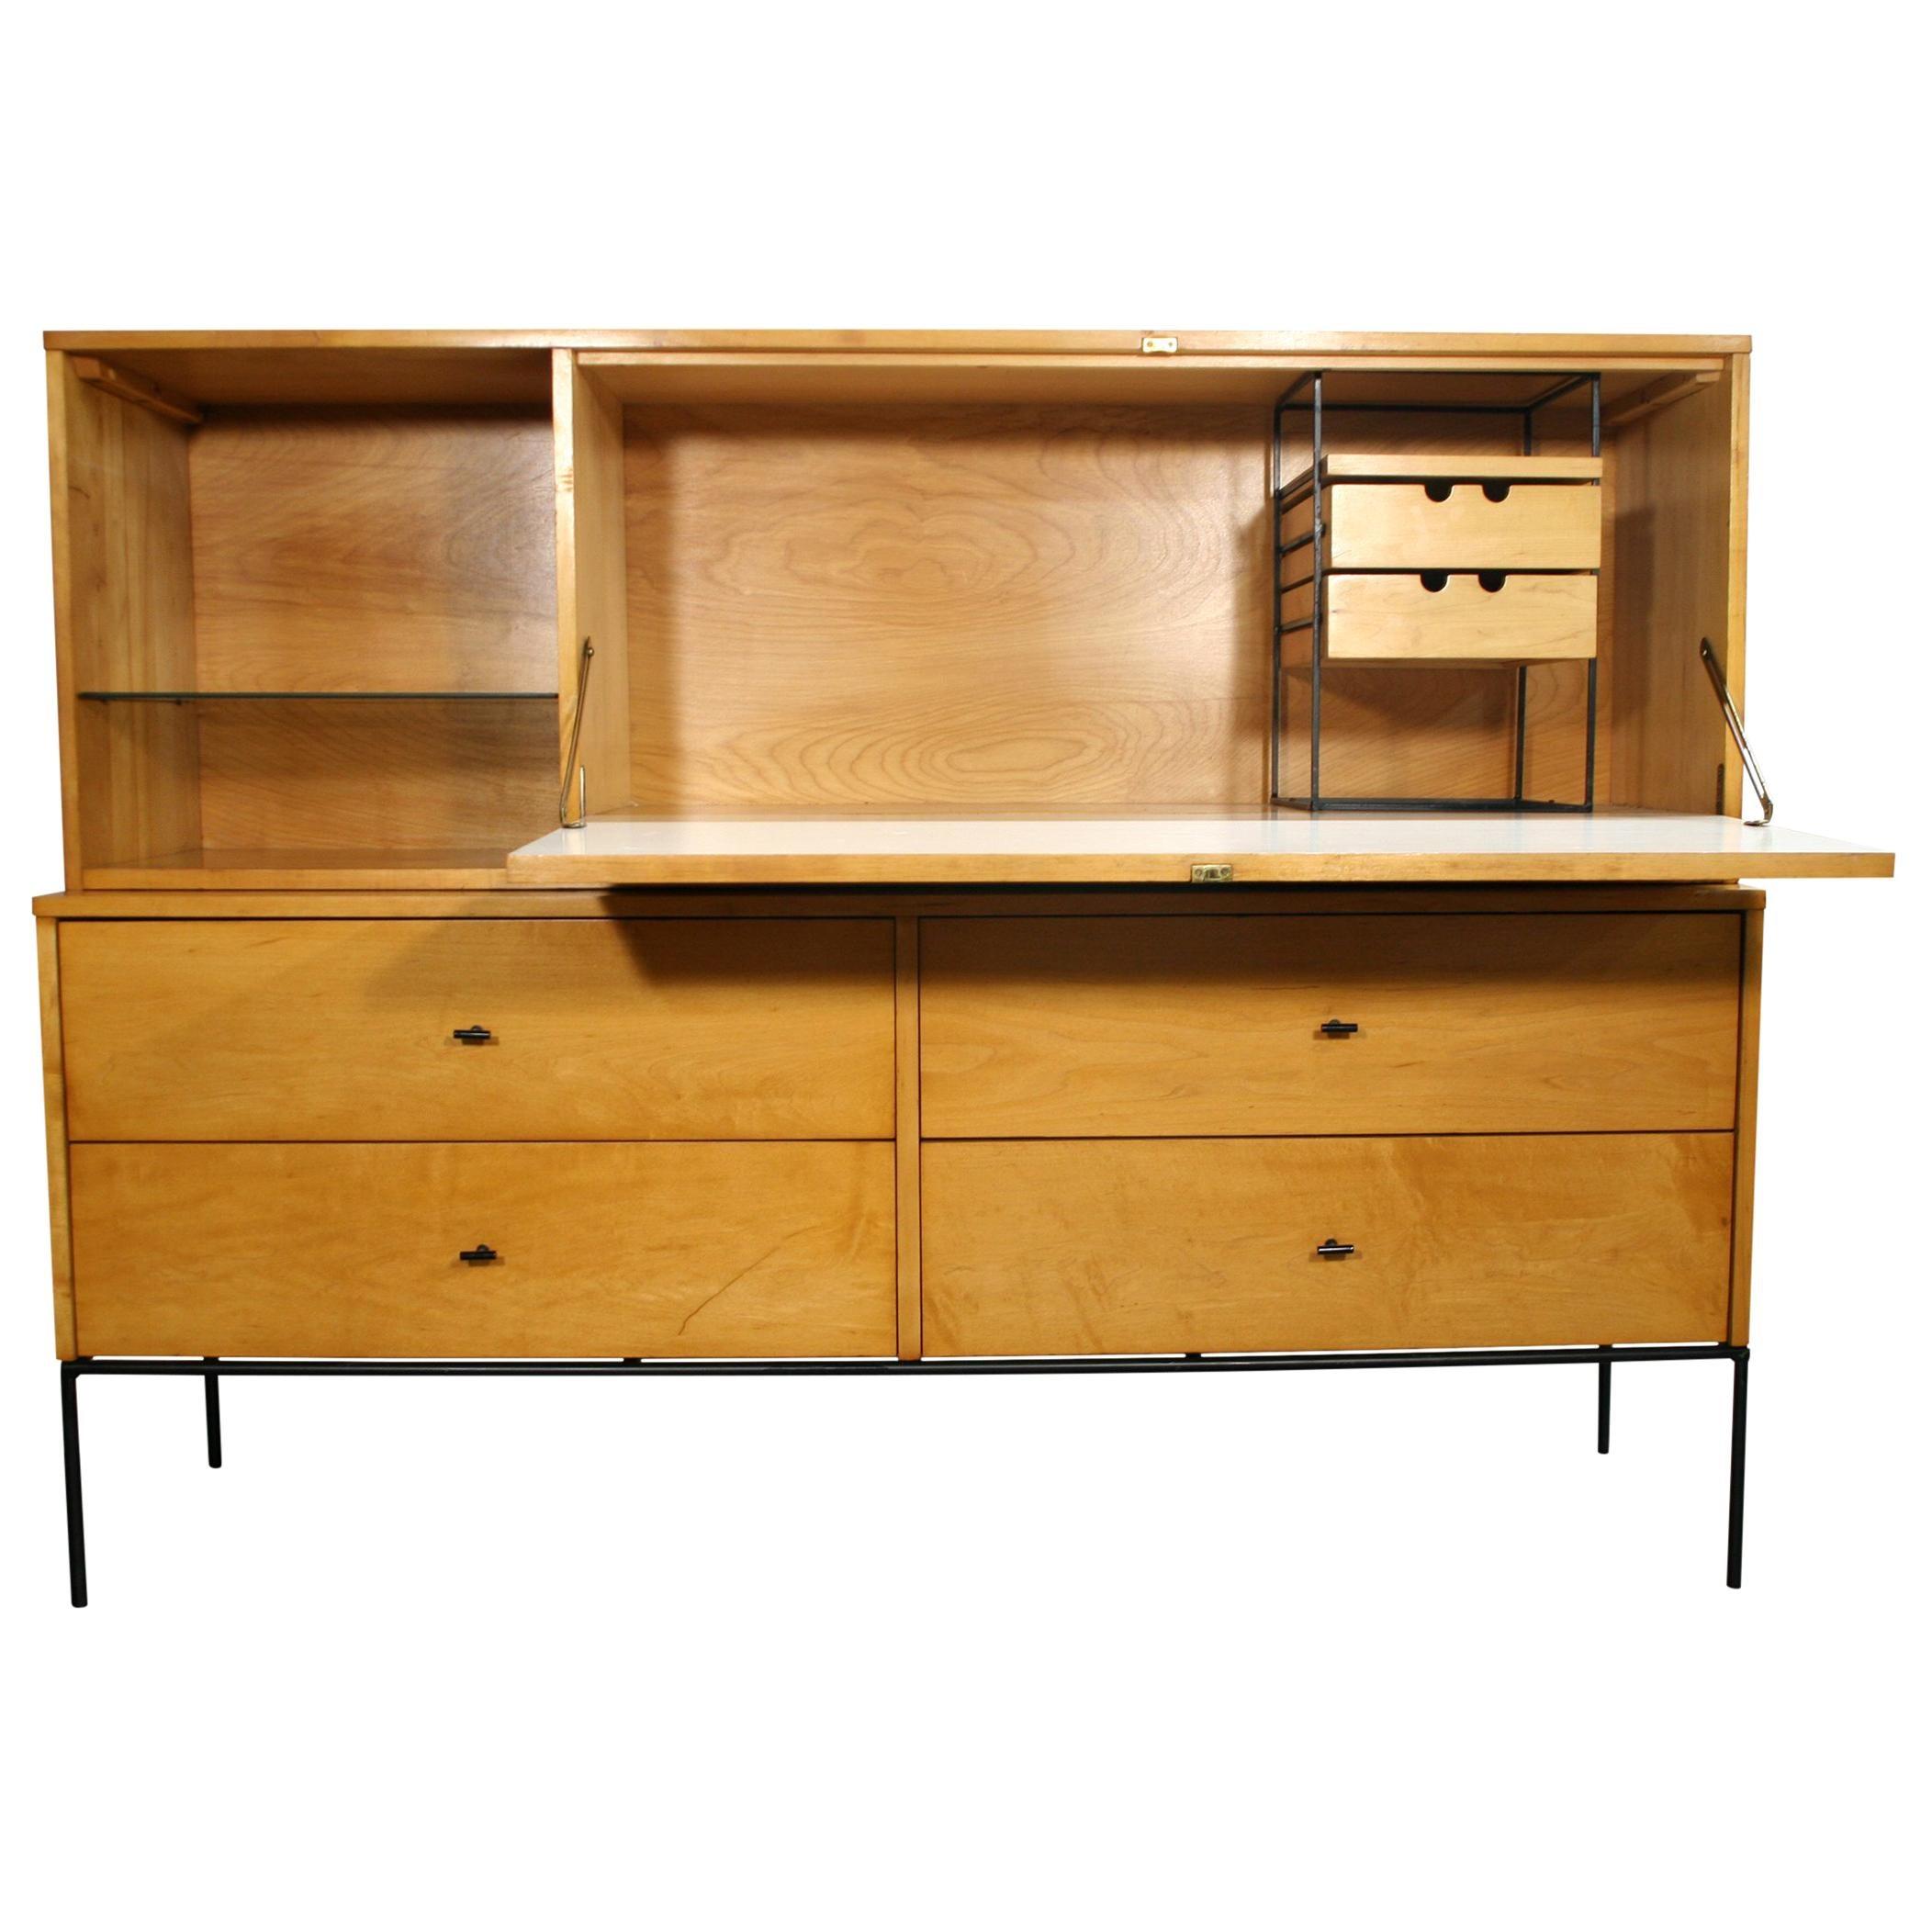 Rare Midcentury Paul McCobb #1562 Drop Lid Desk W/Organizer Maple T Pulls